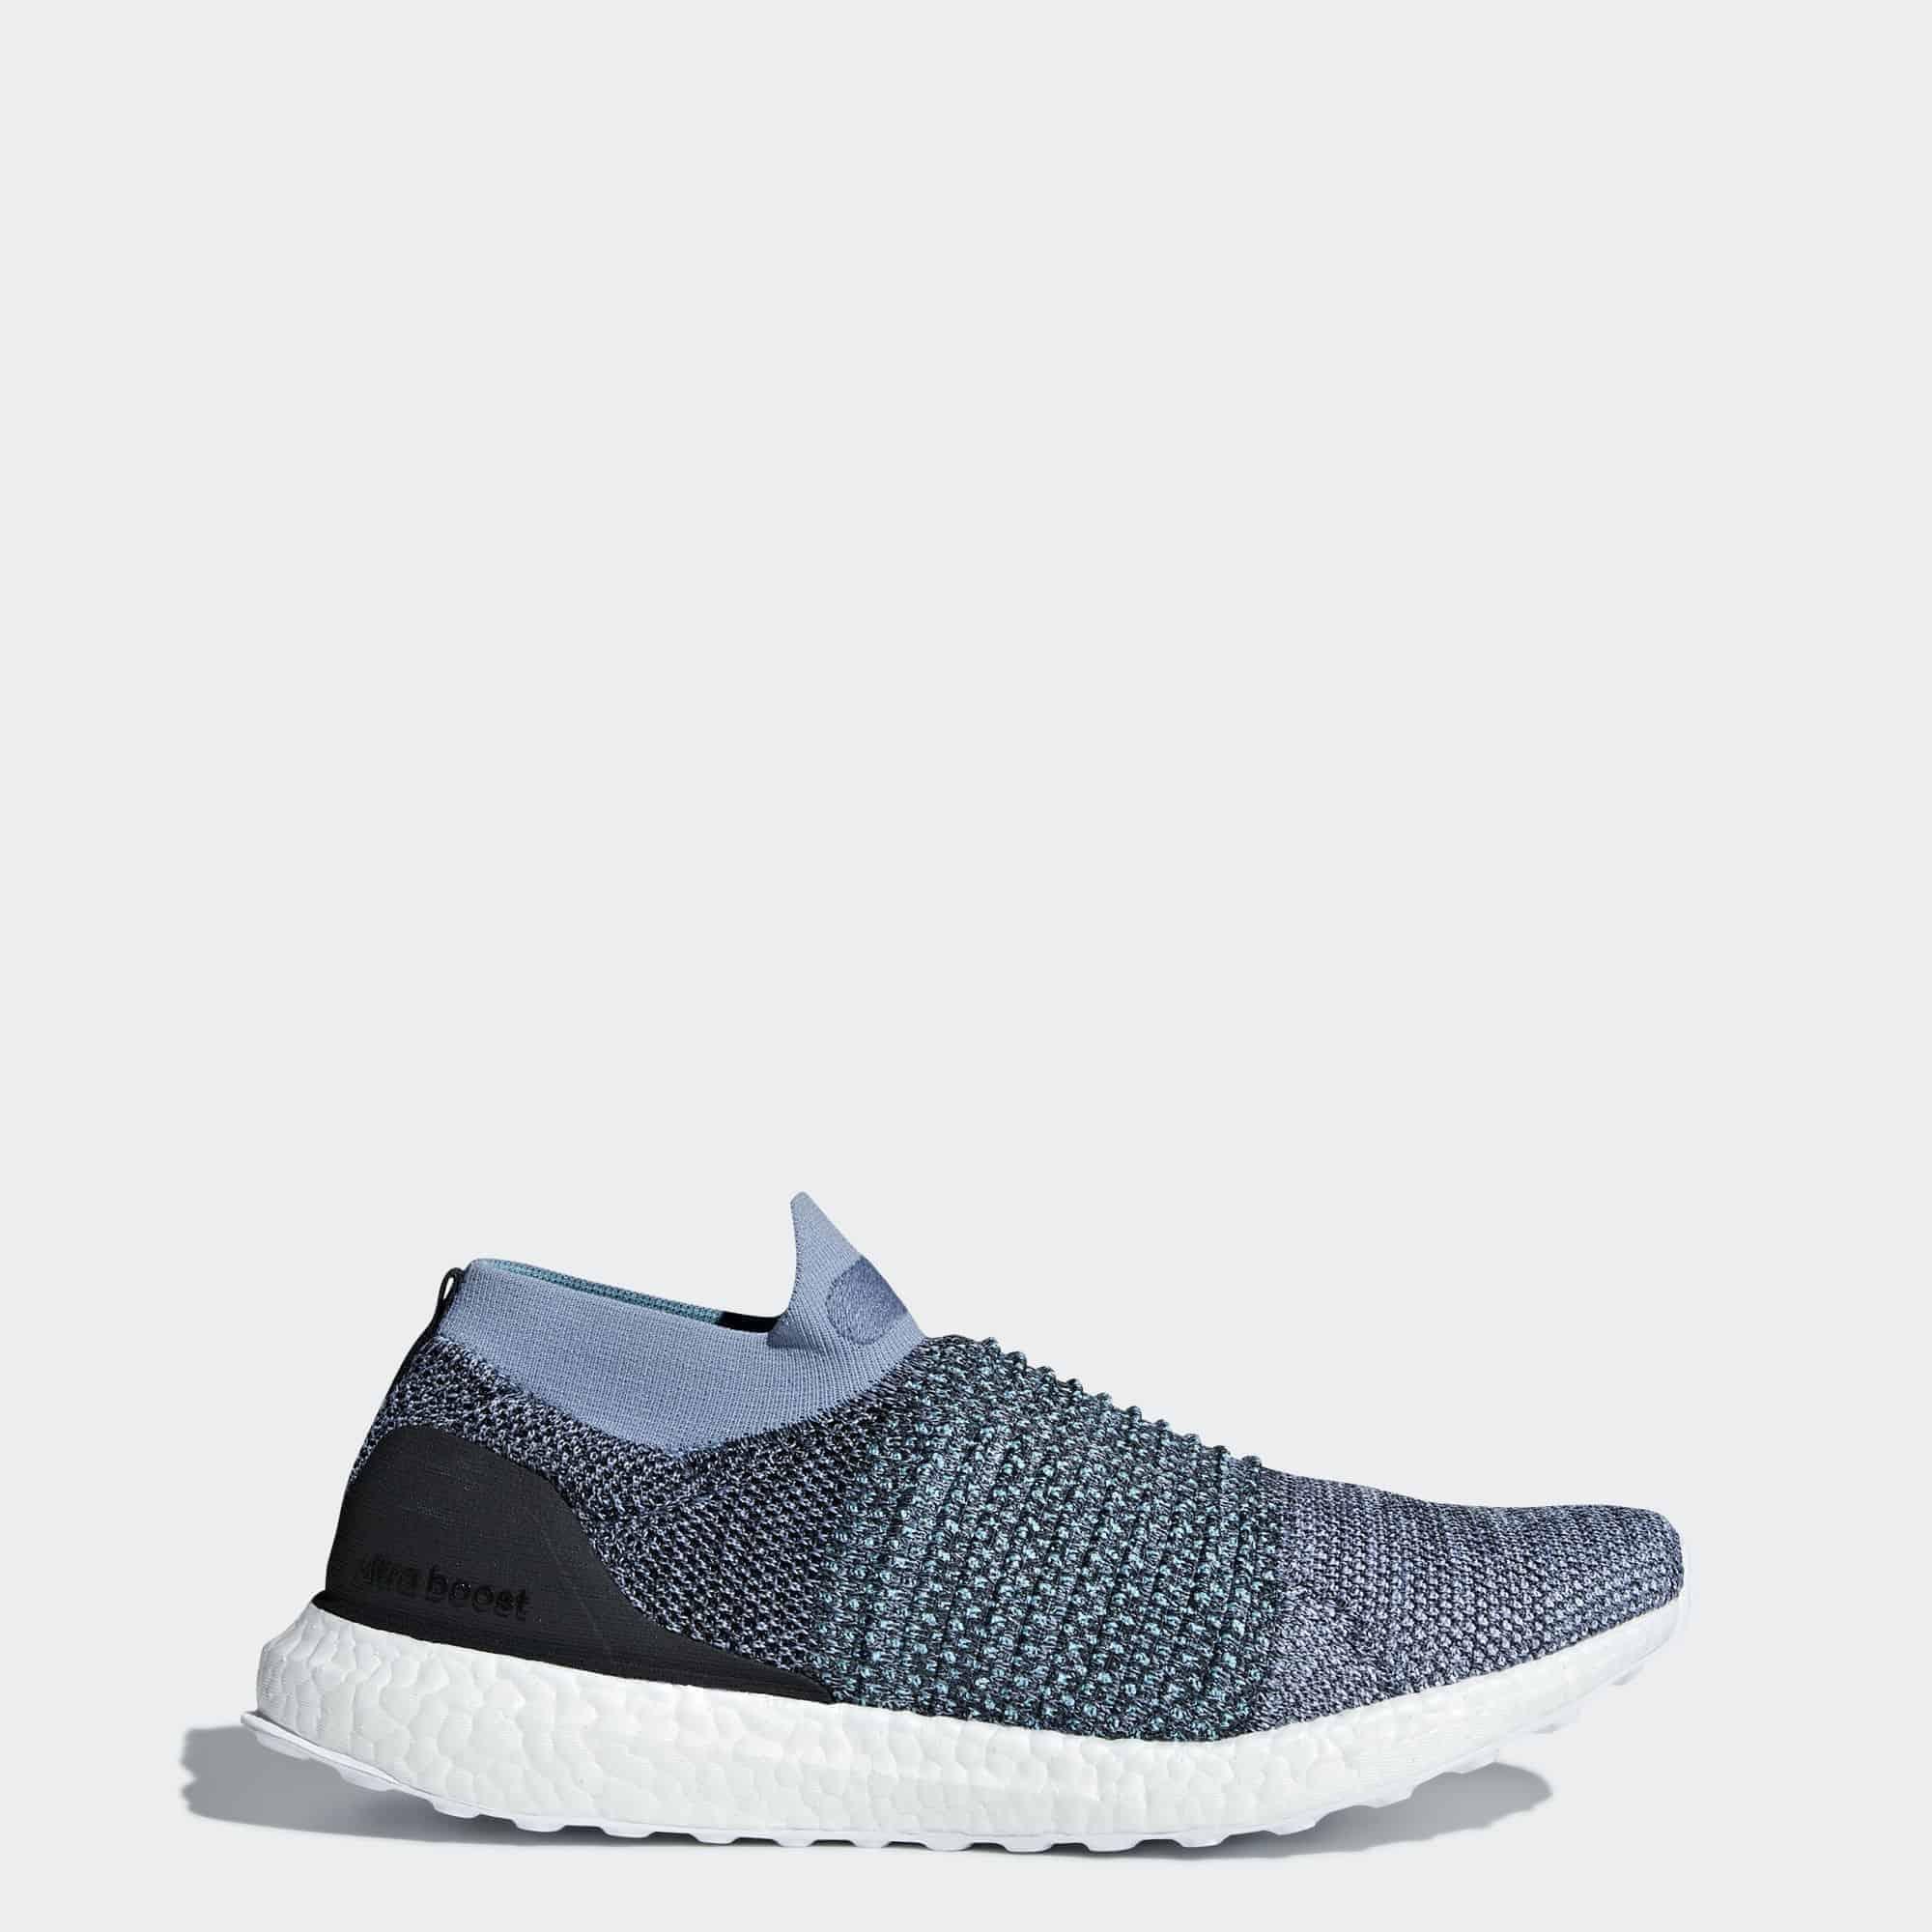 Кроссовки для бега Adidas Ultraboost Laceless Parley мужские